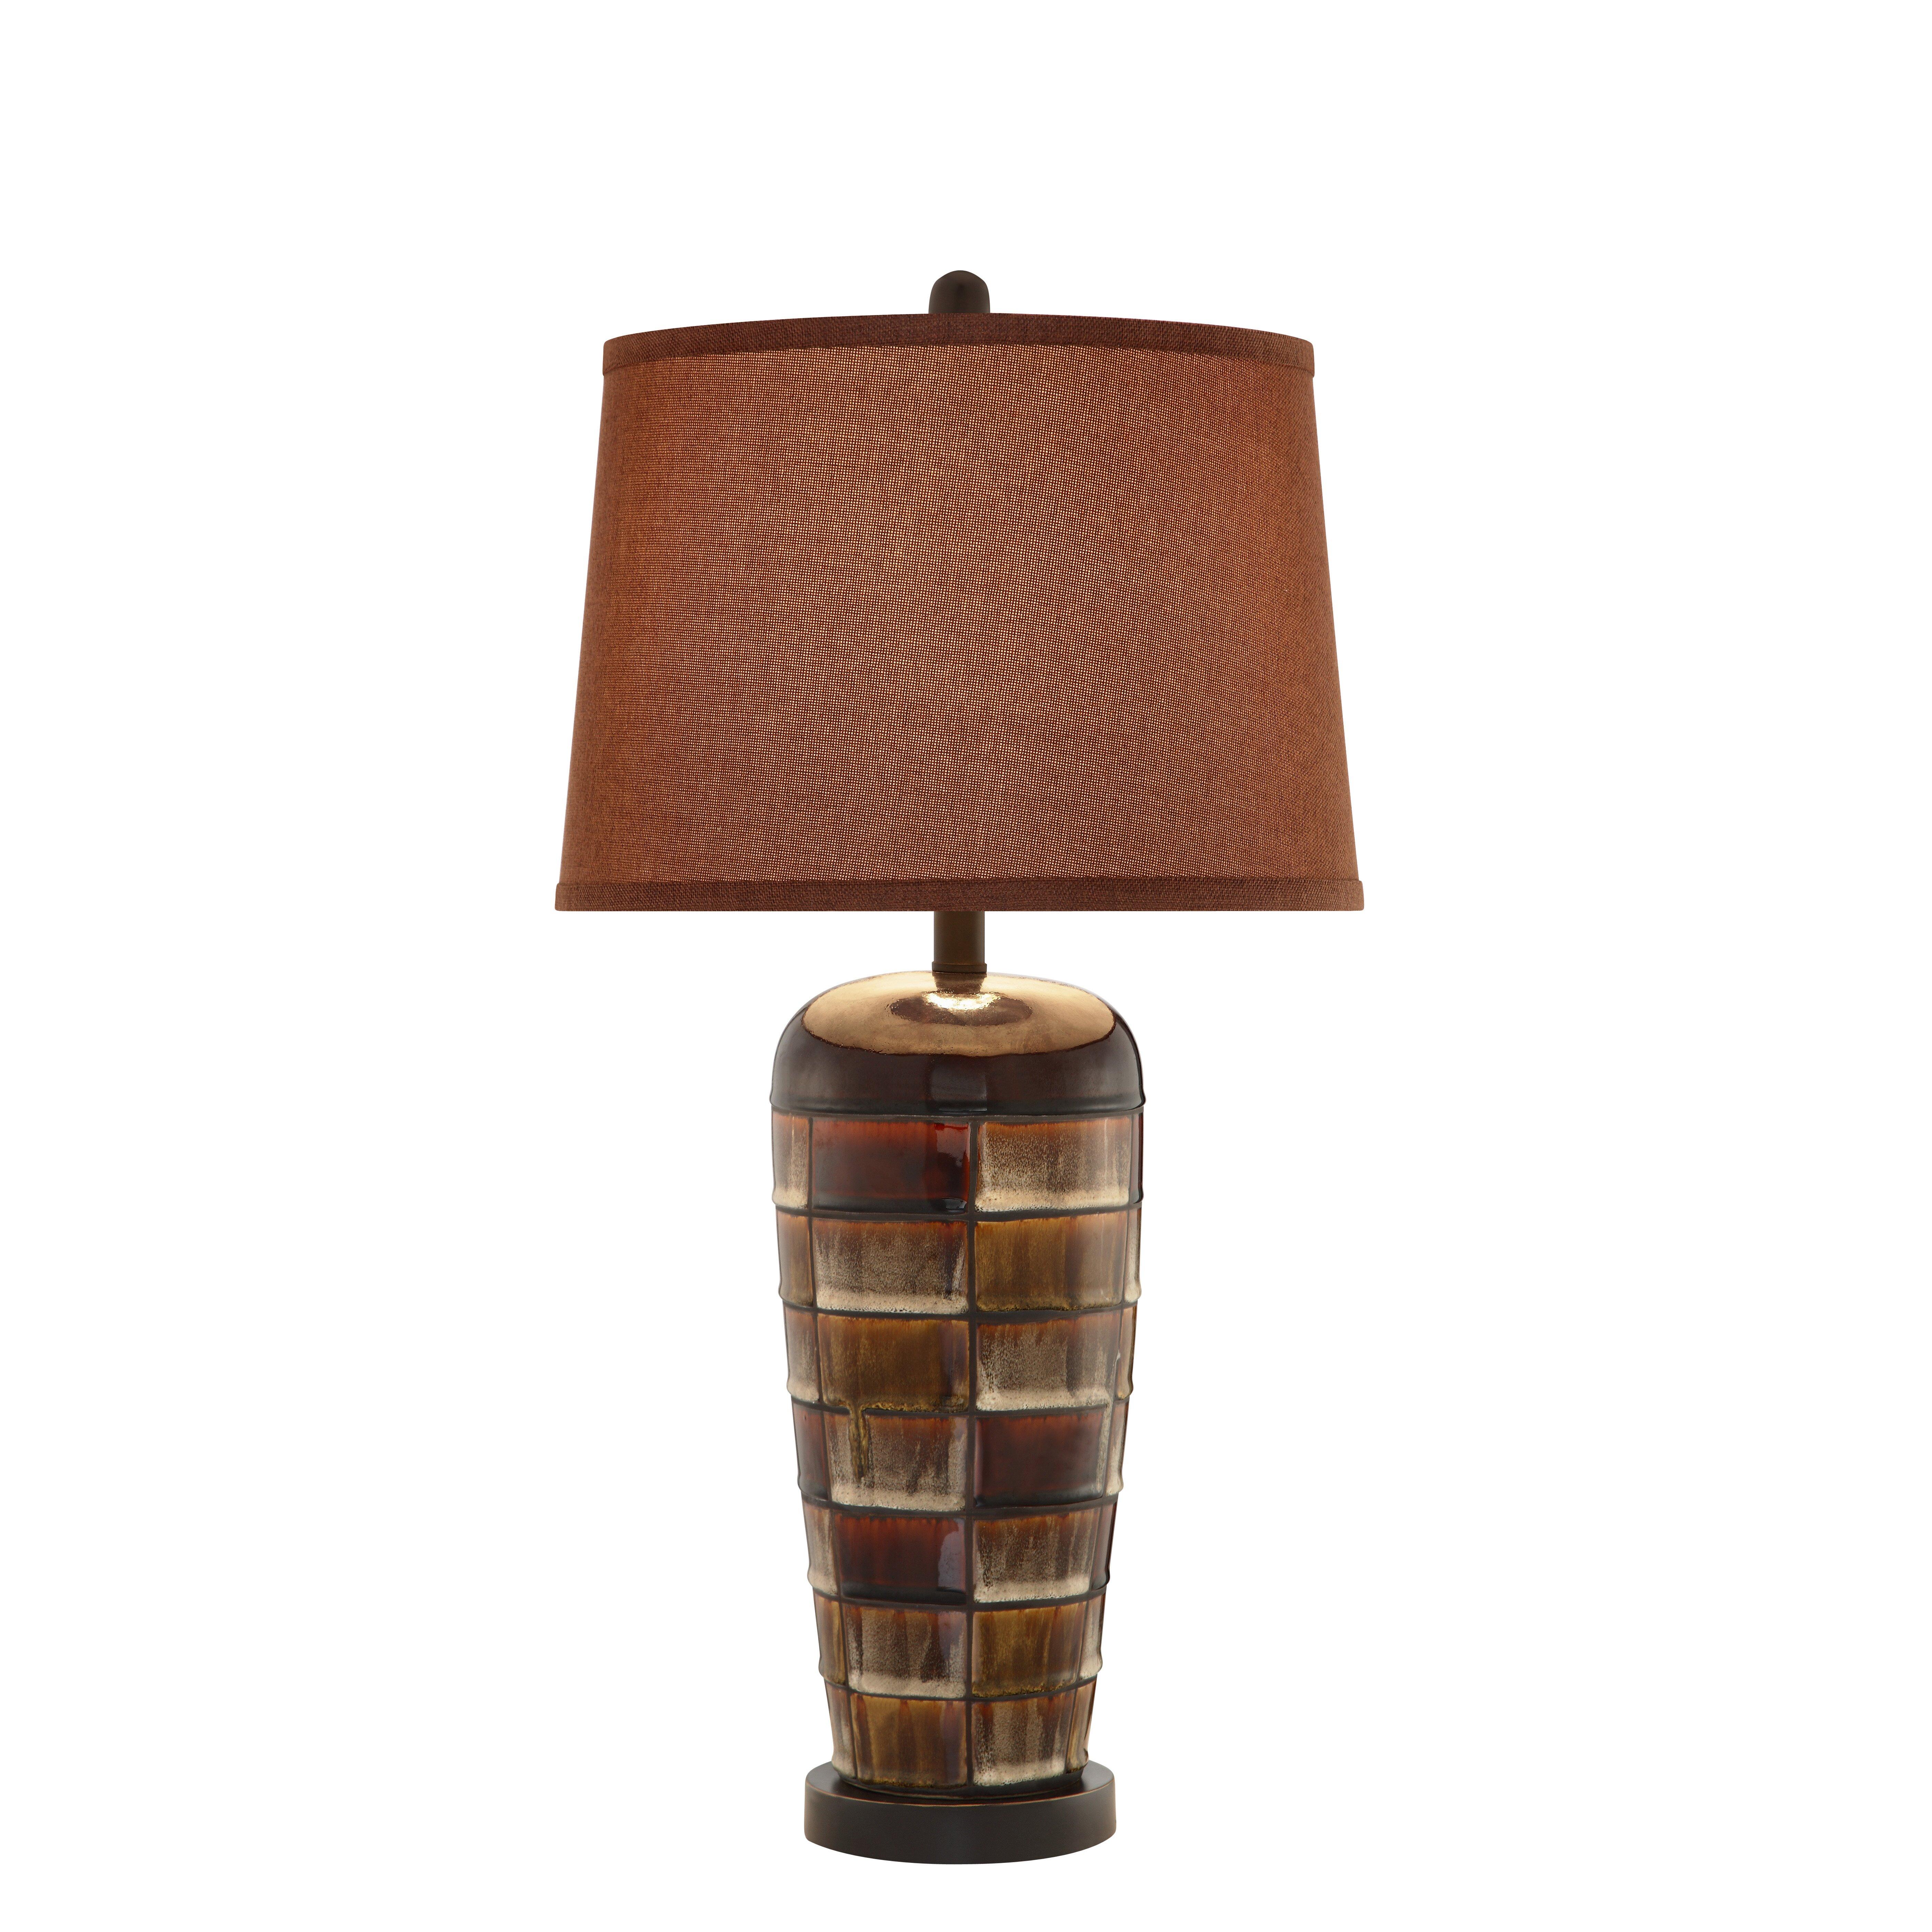 catalina lighting 30 table lamp reviews wayfair. Black Bedroom Furniture Sets. Home Design Ideas